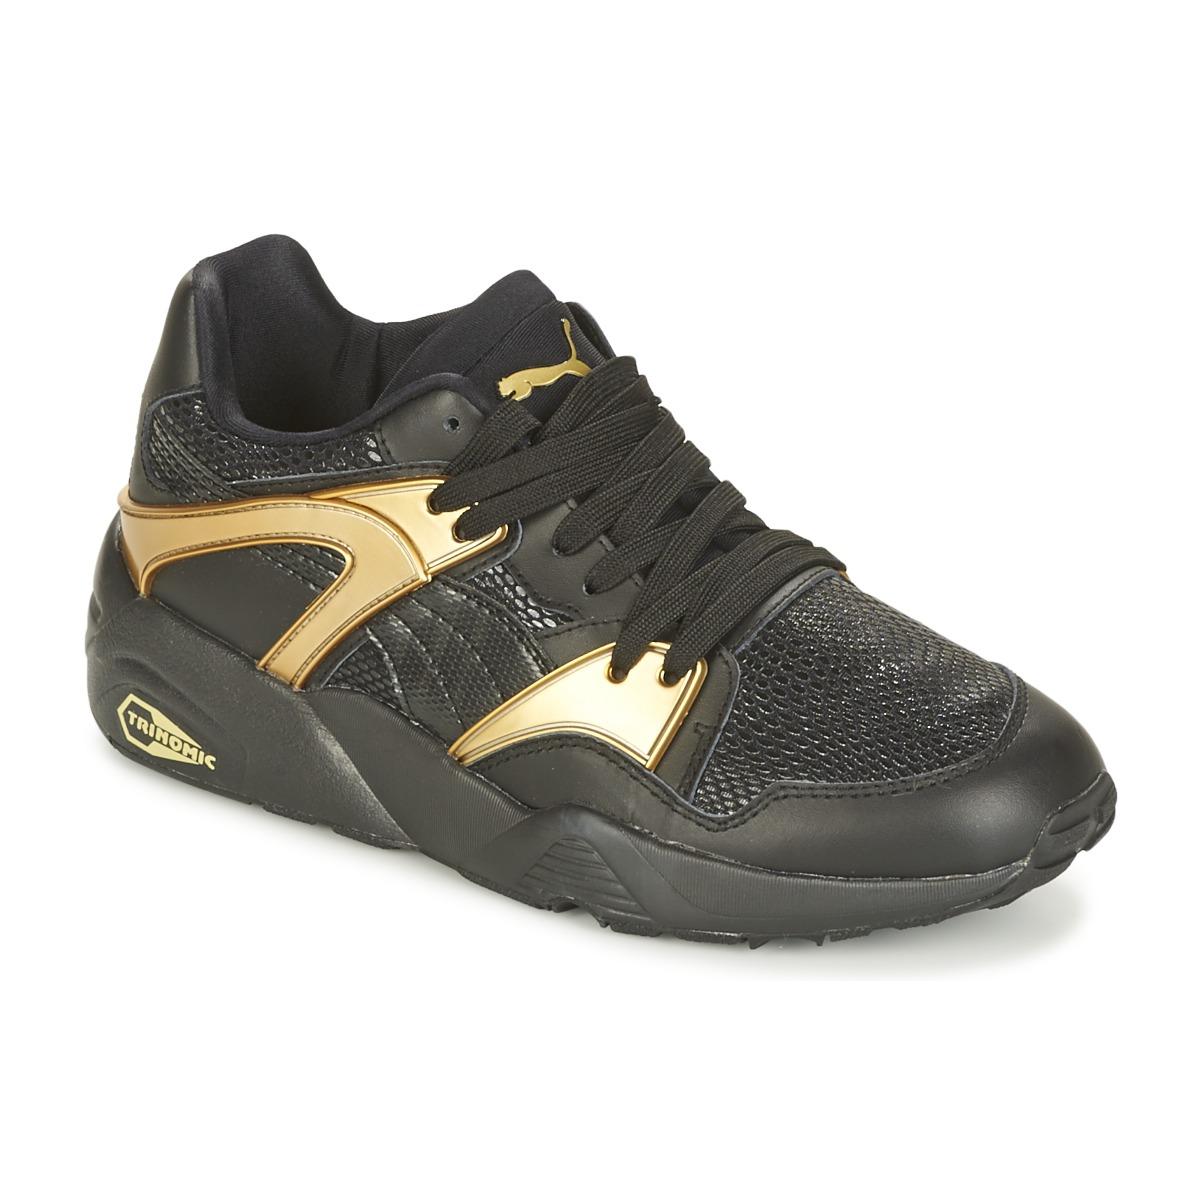 Puma BLAZE GOLD WN'S Schwarz / Gold - Kostenloser Versand bei Spartoode ! - Schuhe Sneaker Low Damen 87,20 €